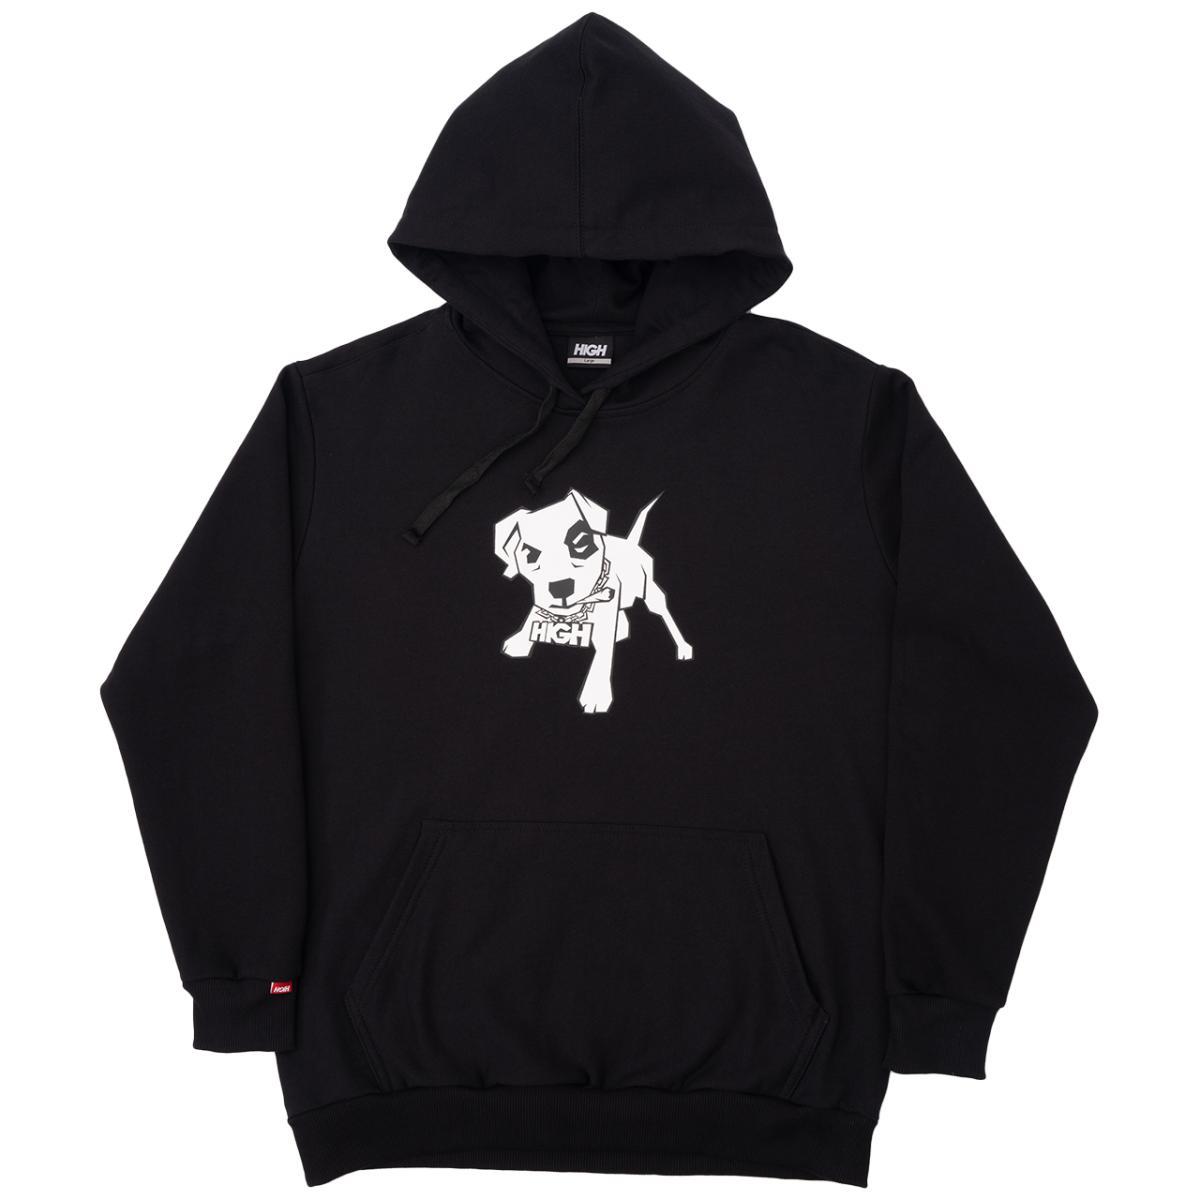 Mutt hoodie black high